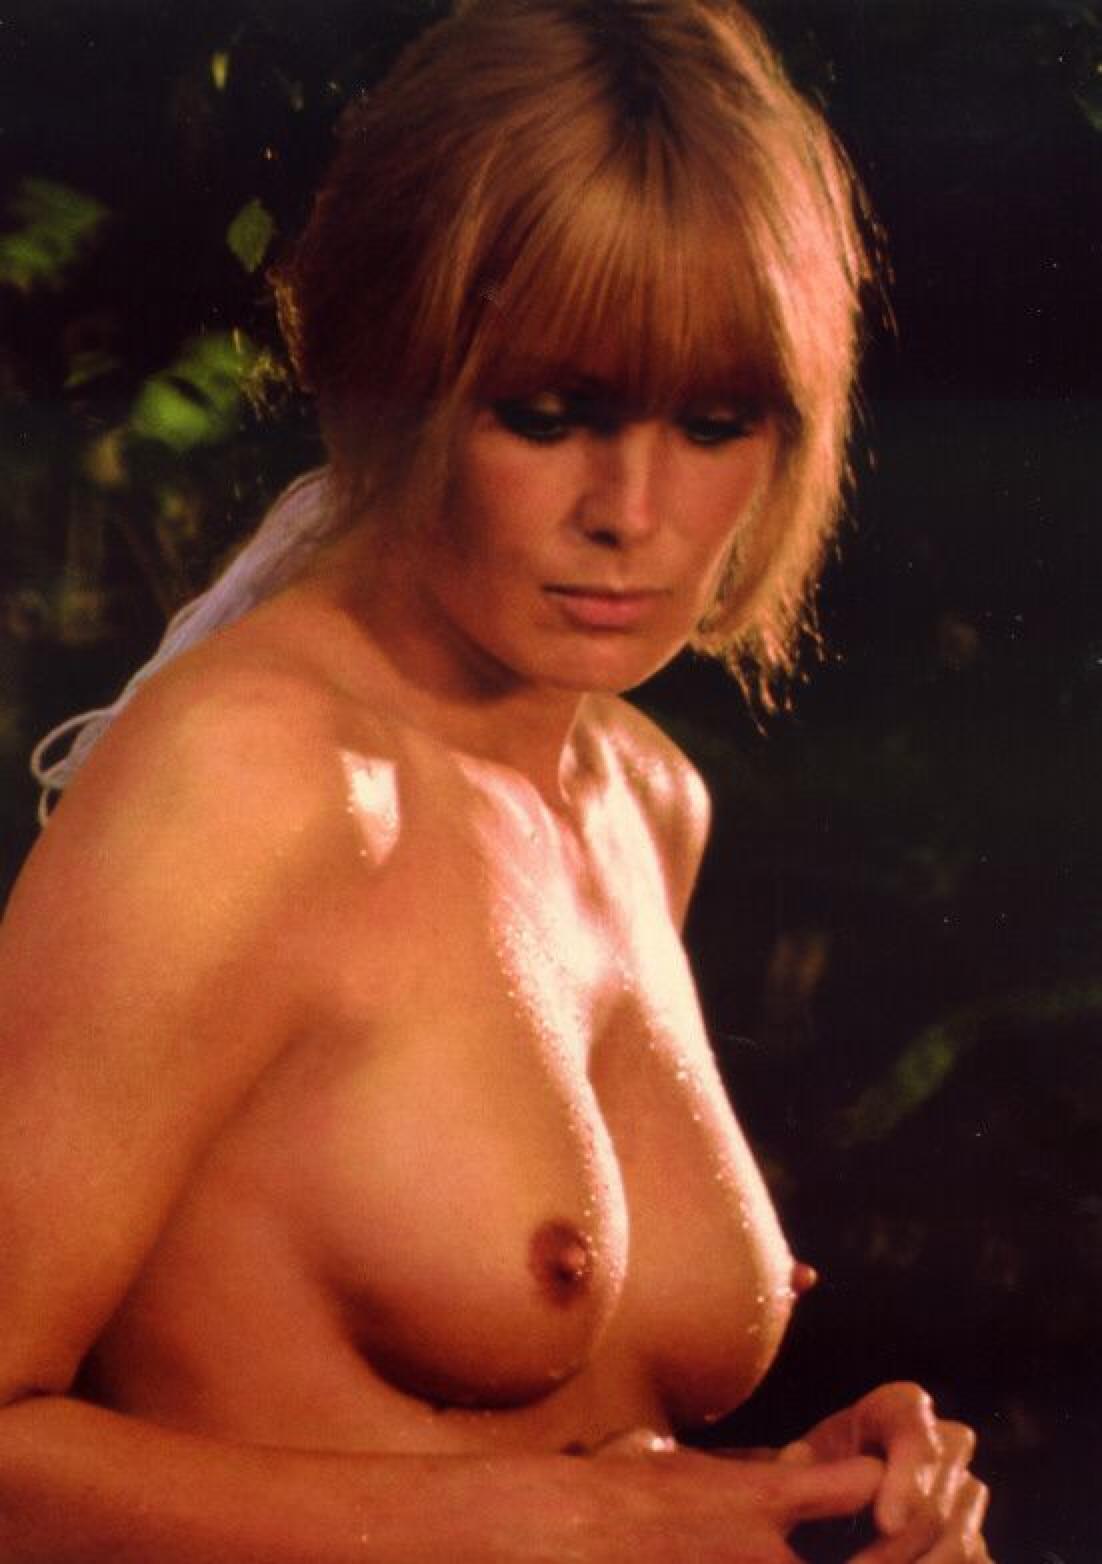 Sisterxxxporn sex pictures